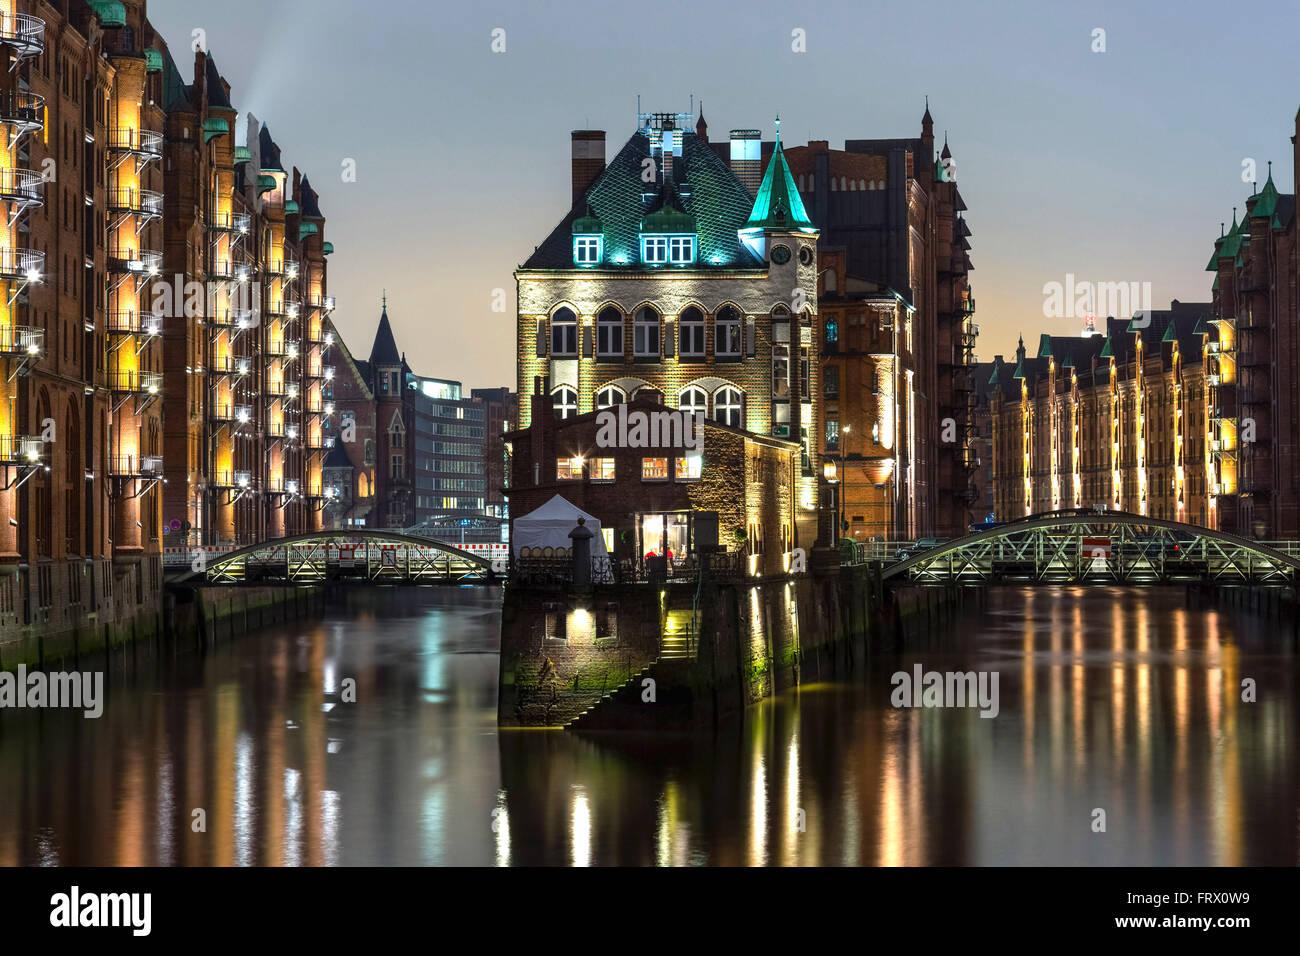 Wasserschloss building in Hansestadt of Hamburg, Germany Stock Photo